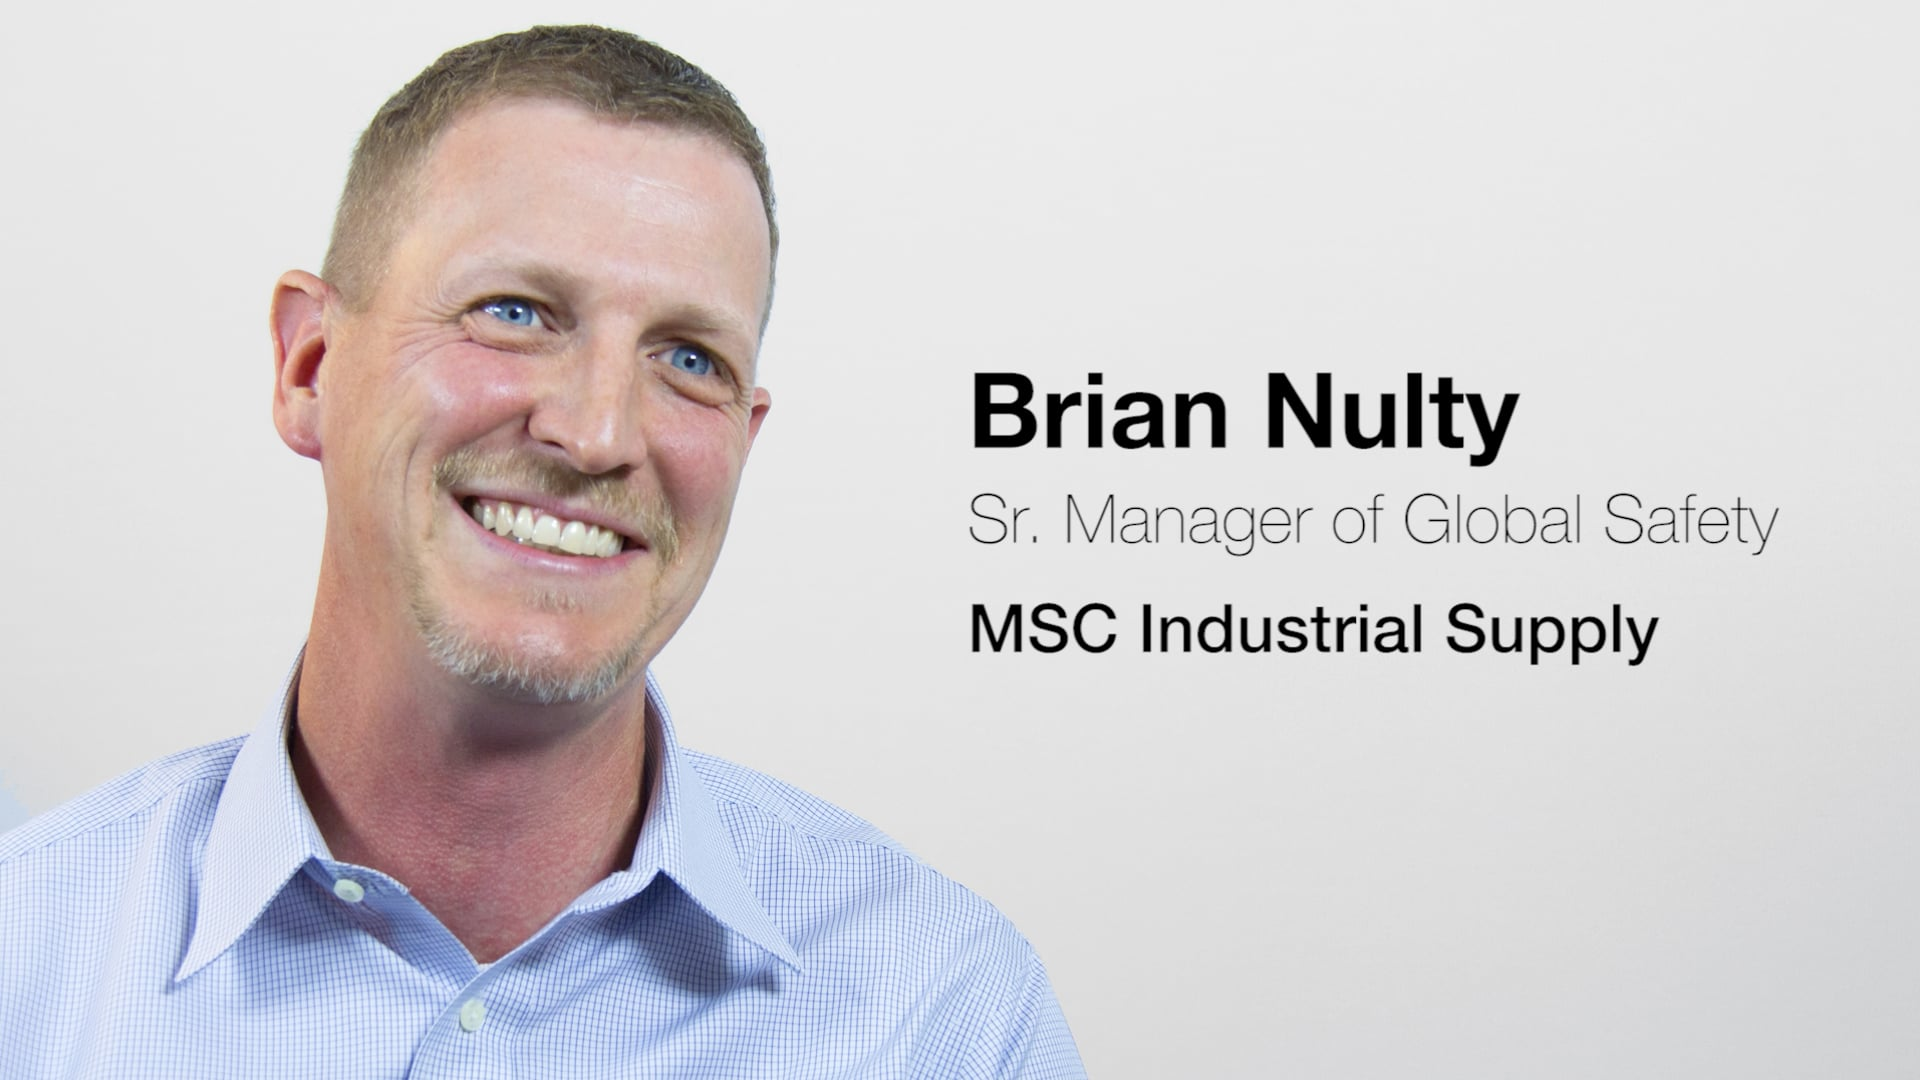 MSC Industrial Supply | Brian Nulty